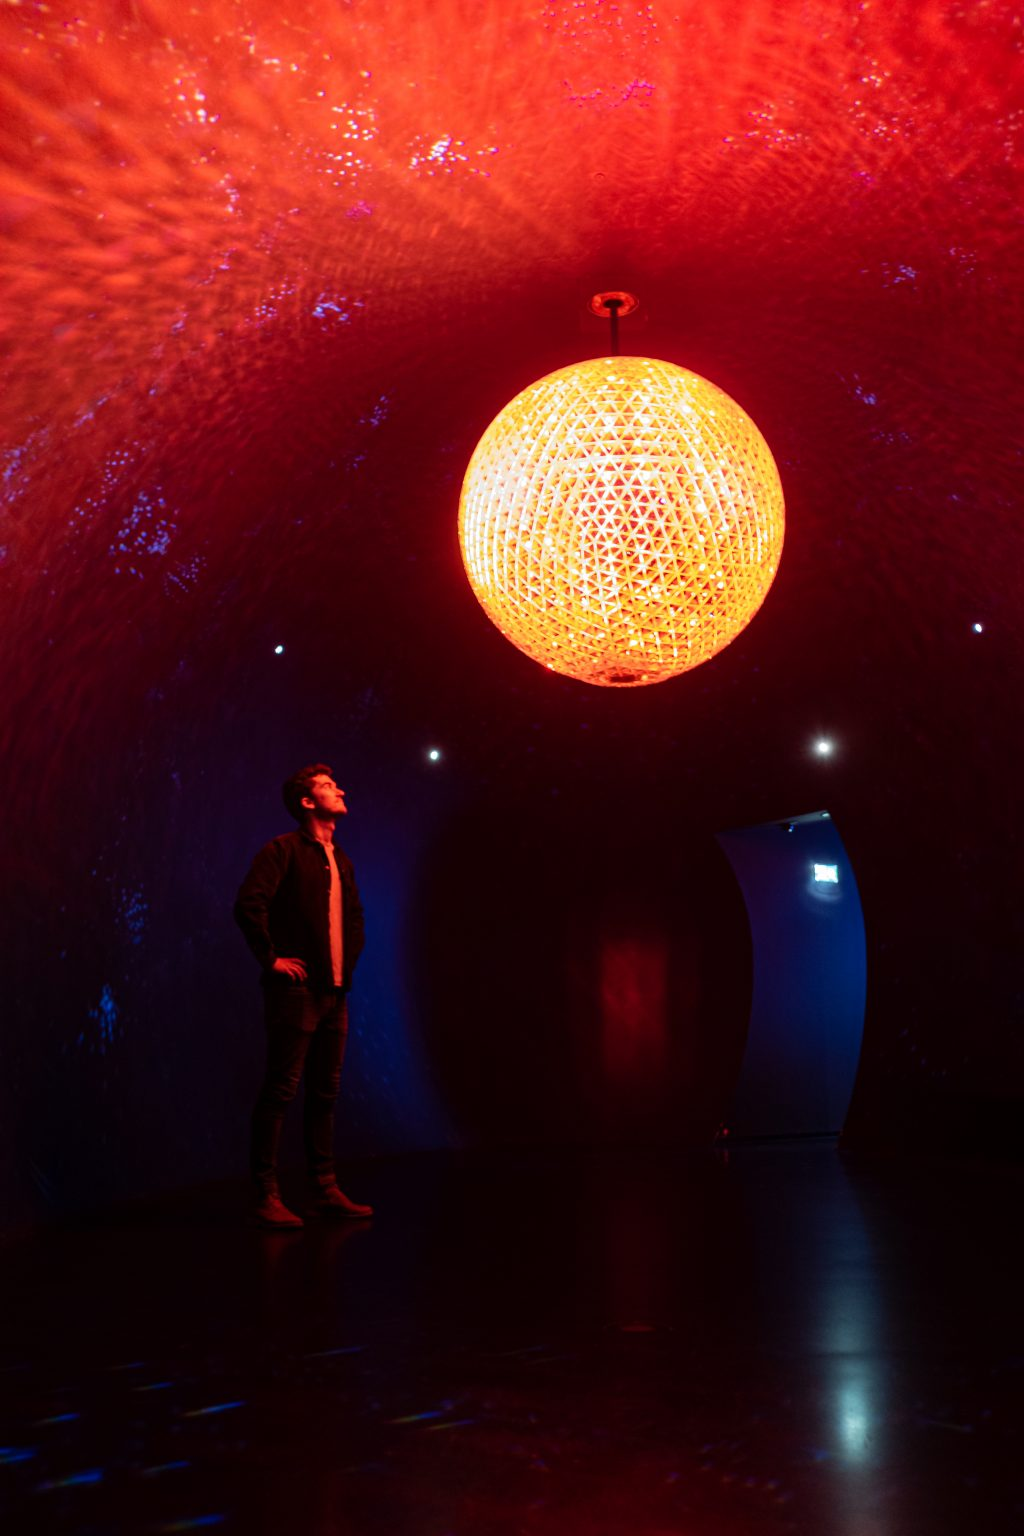 Wonderkamer 'El Sol' van Fernando Romero